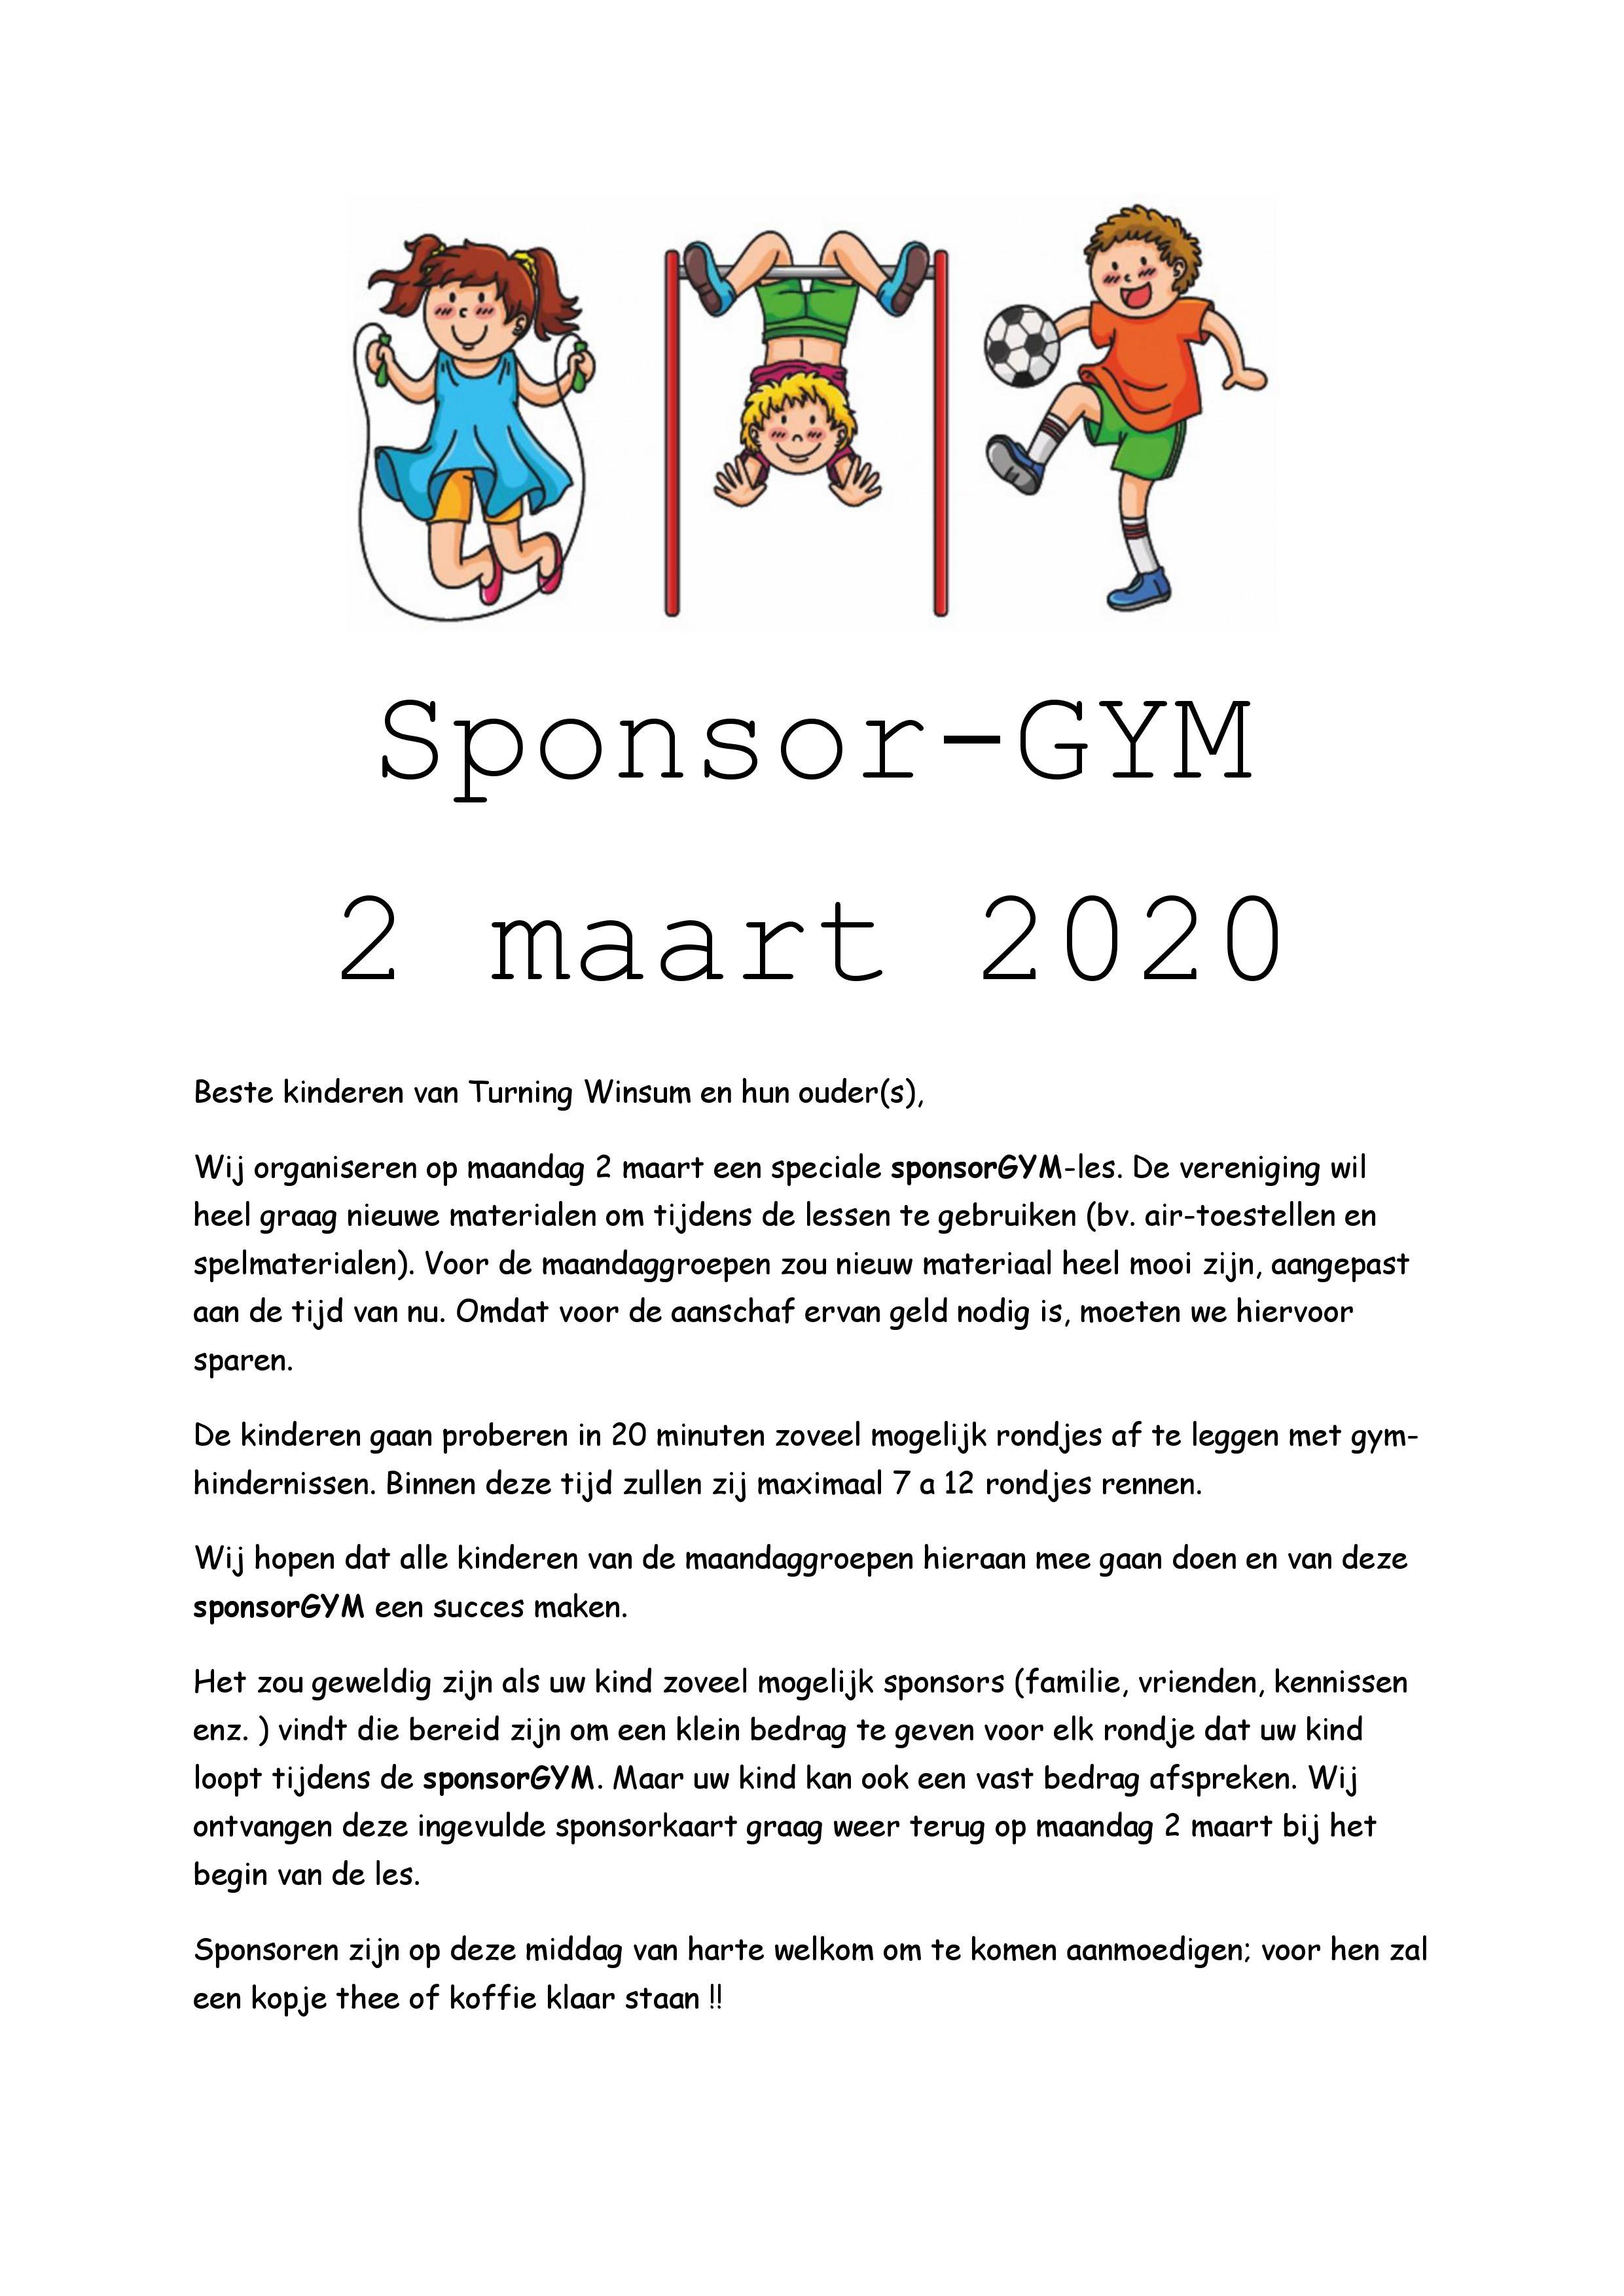 Sponsor-gym